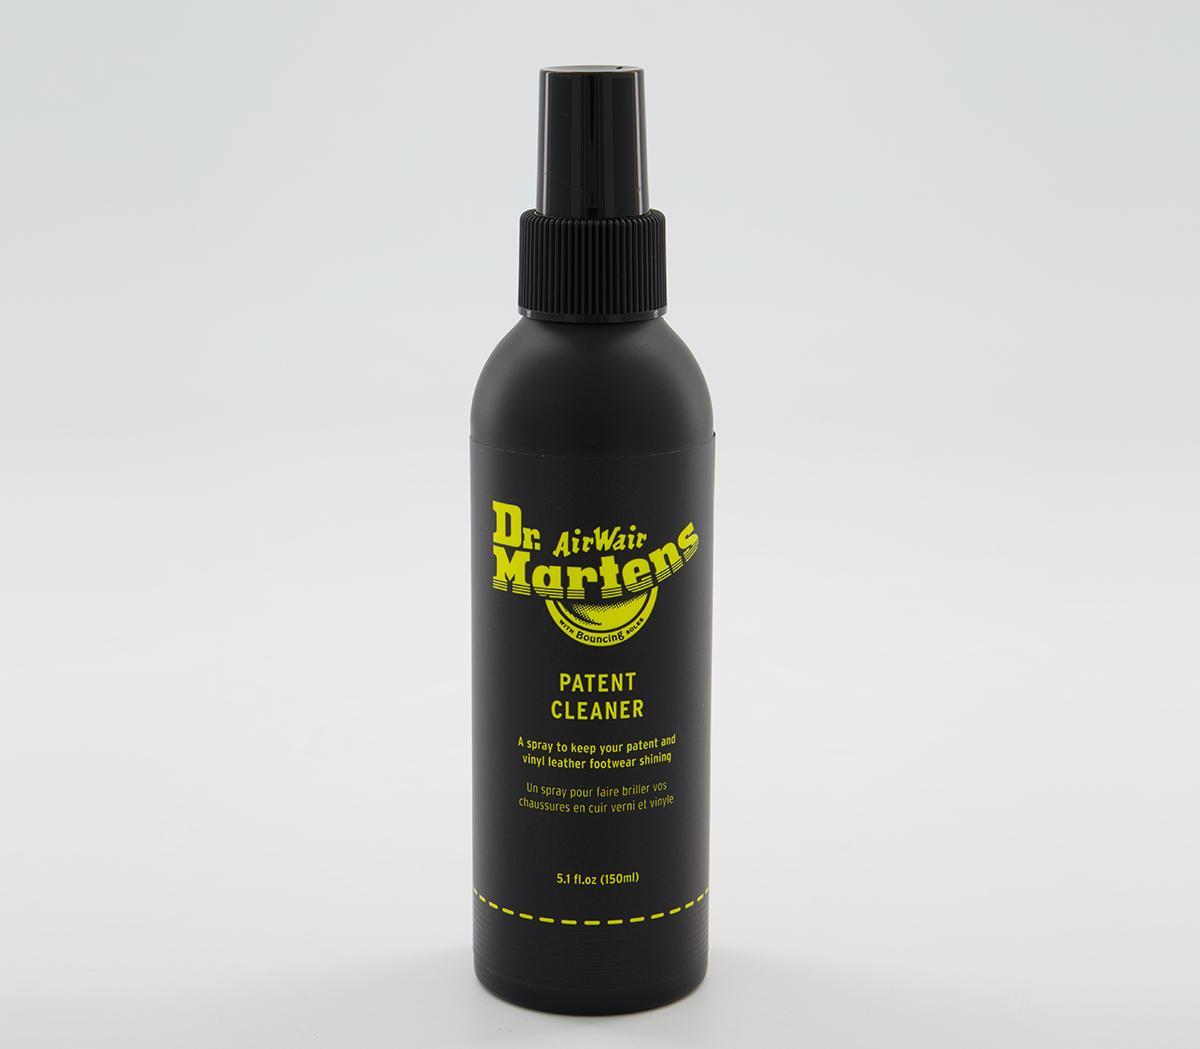 Patent Cleaner Spray